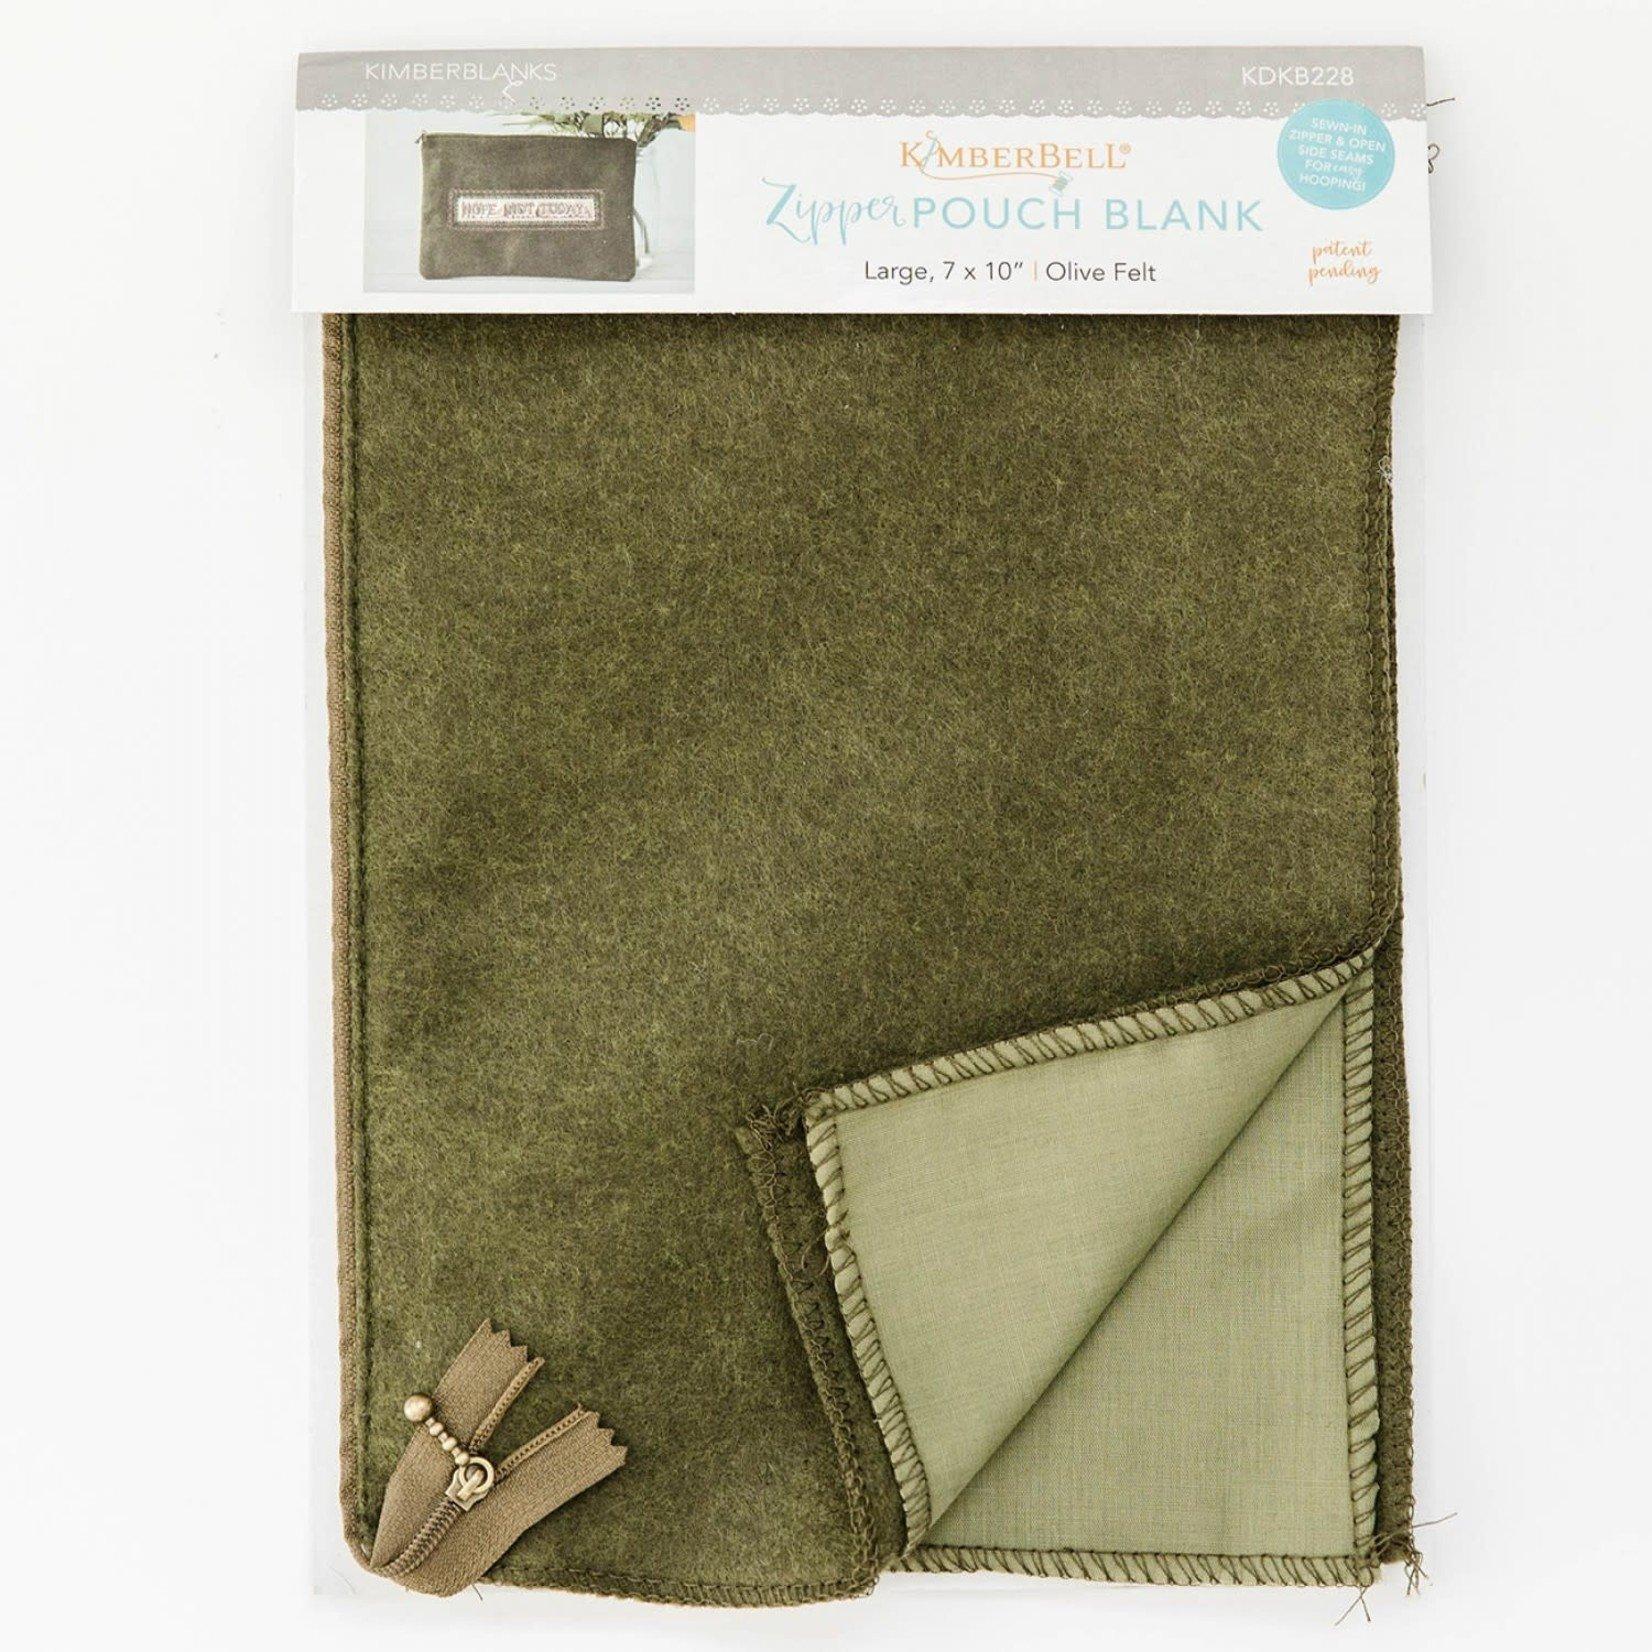 Kimberbell Designs Olive Felt Zipper Pouch Blank, Large